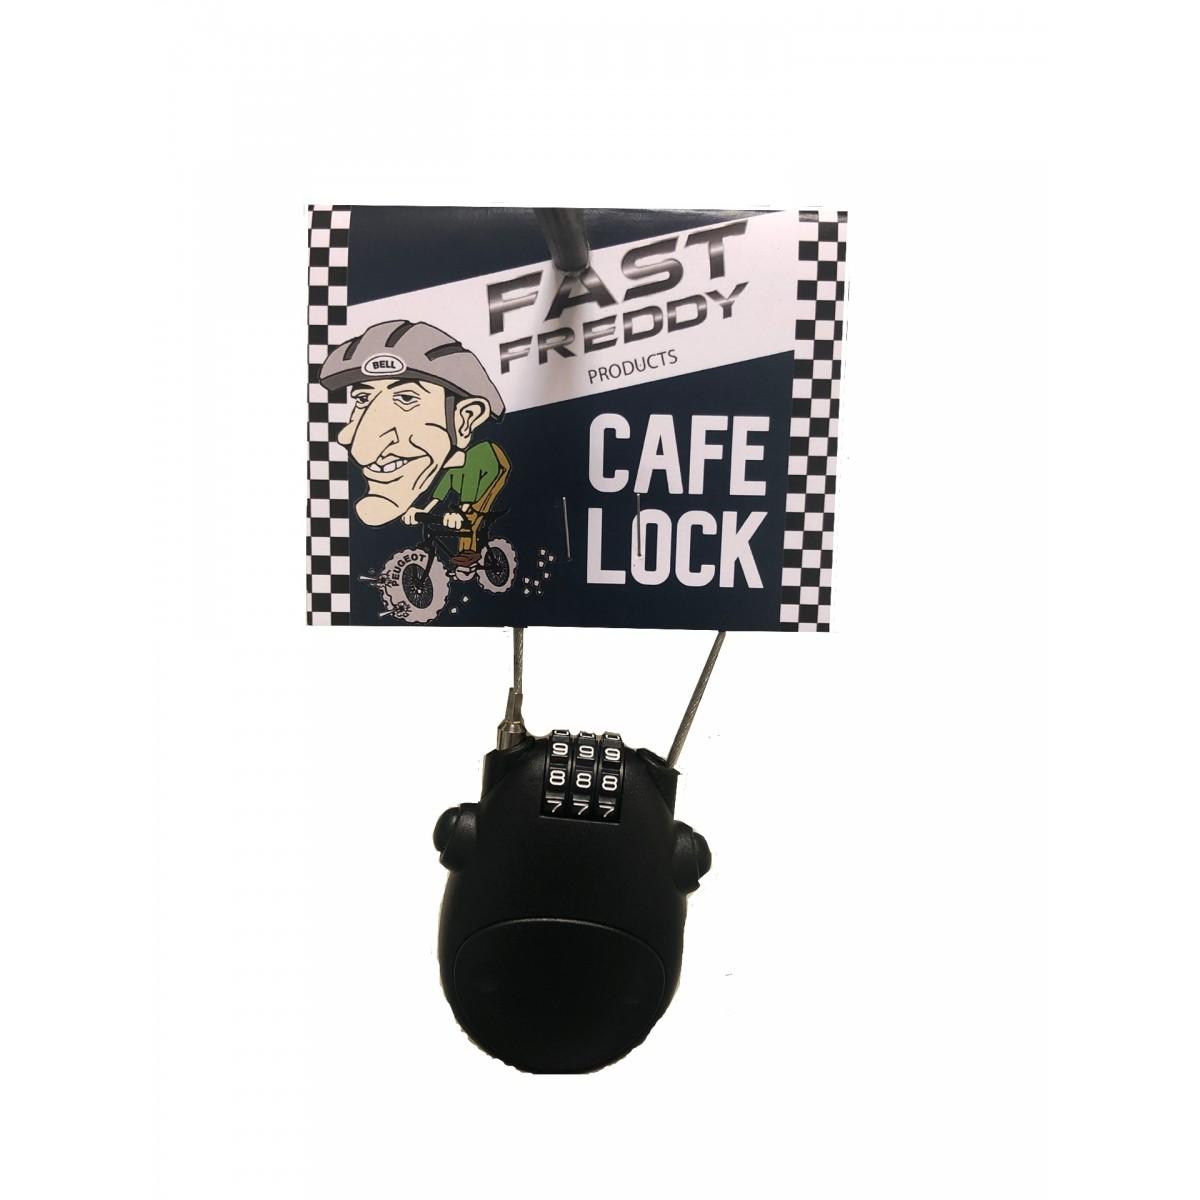 Ski Lock Bicycle Cafe Lock Wheel Fast Freddy Café Lock – Bike Helmet